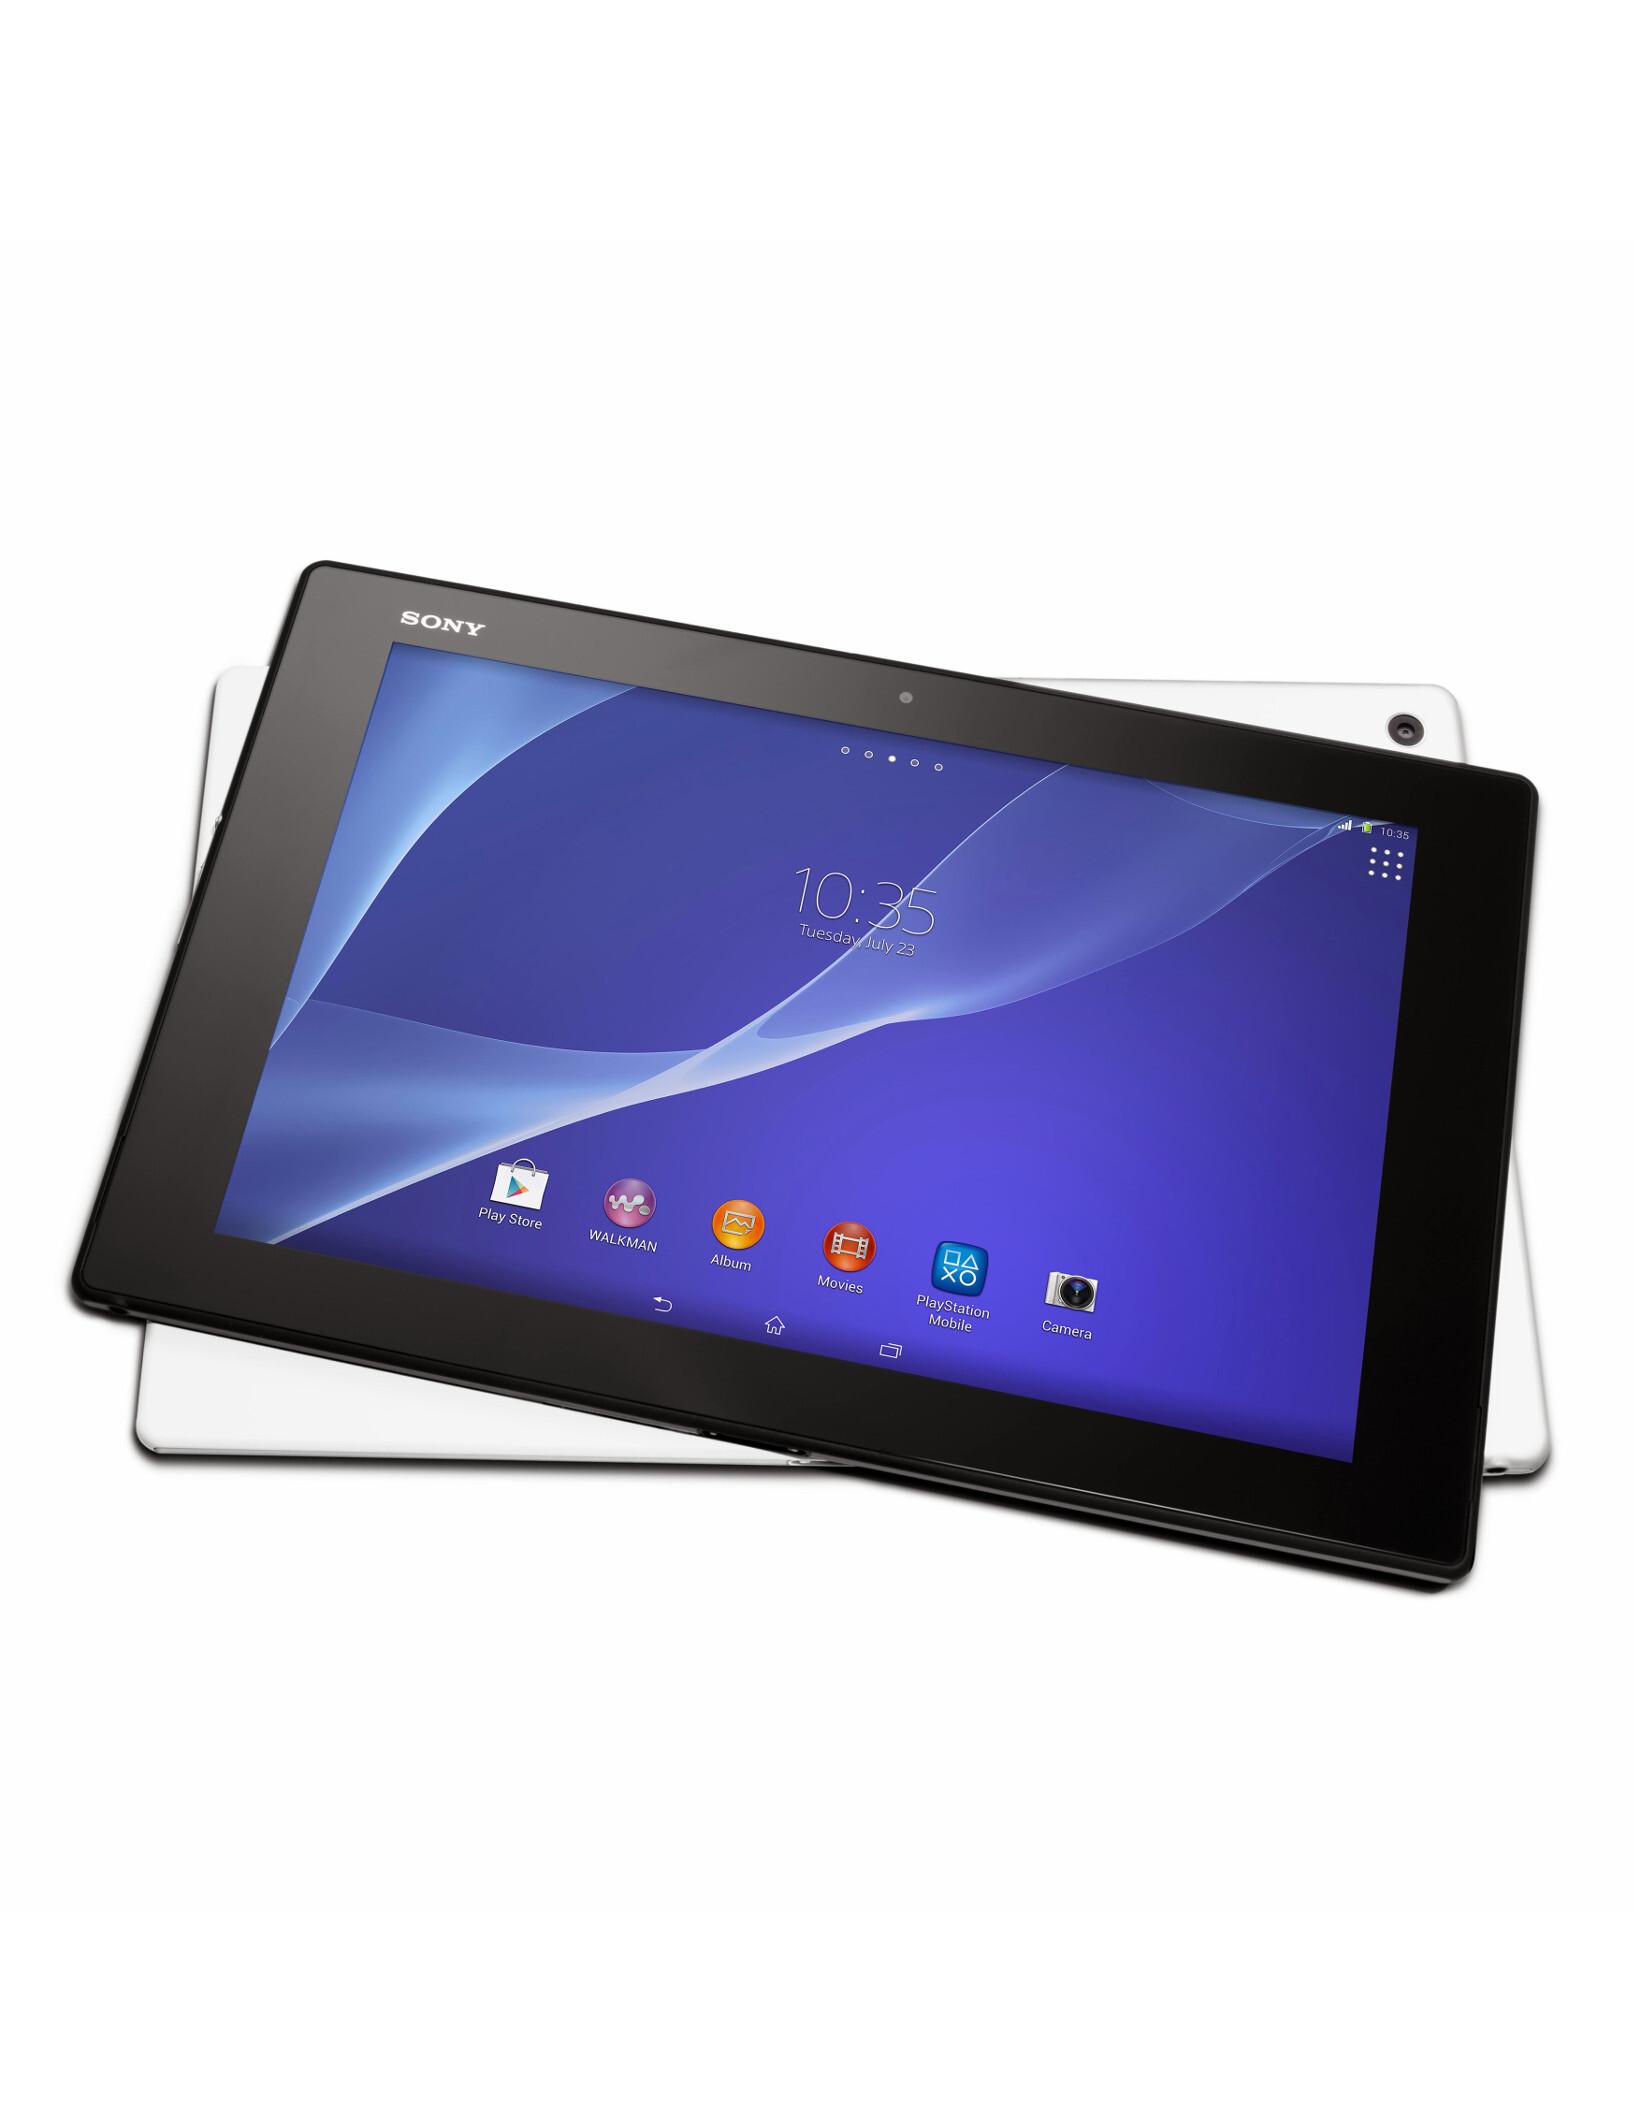 4g Blue Tick Phones Sony Xperia Z Tablet